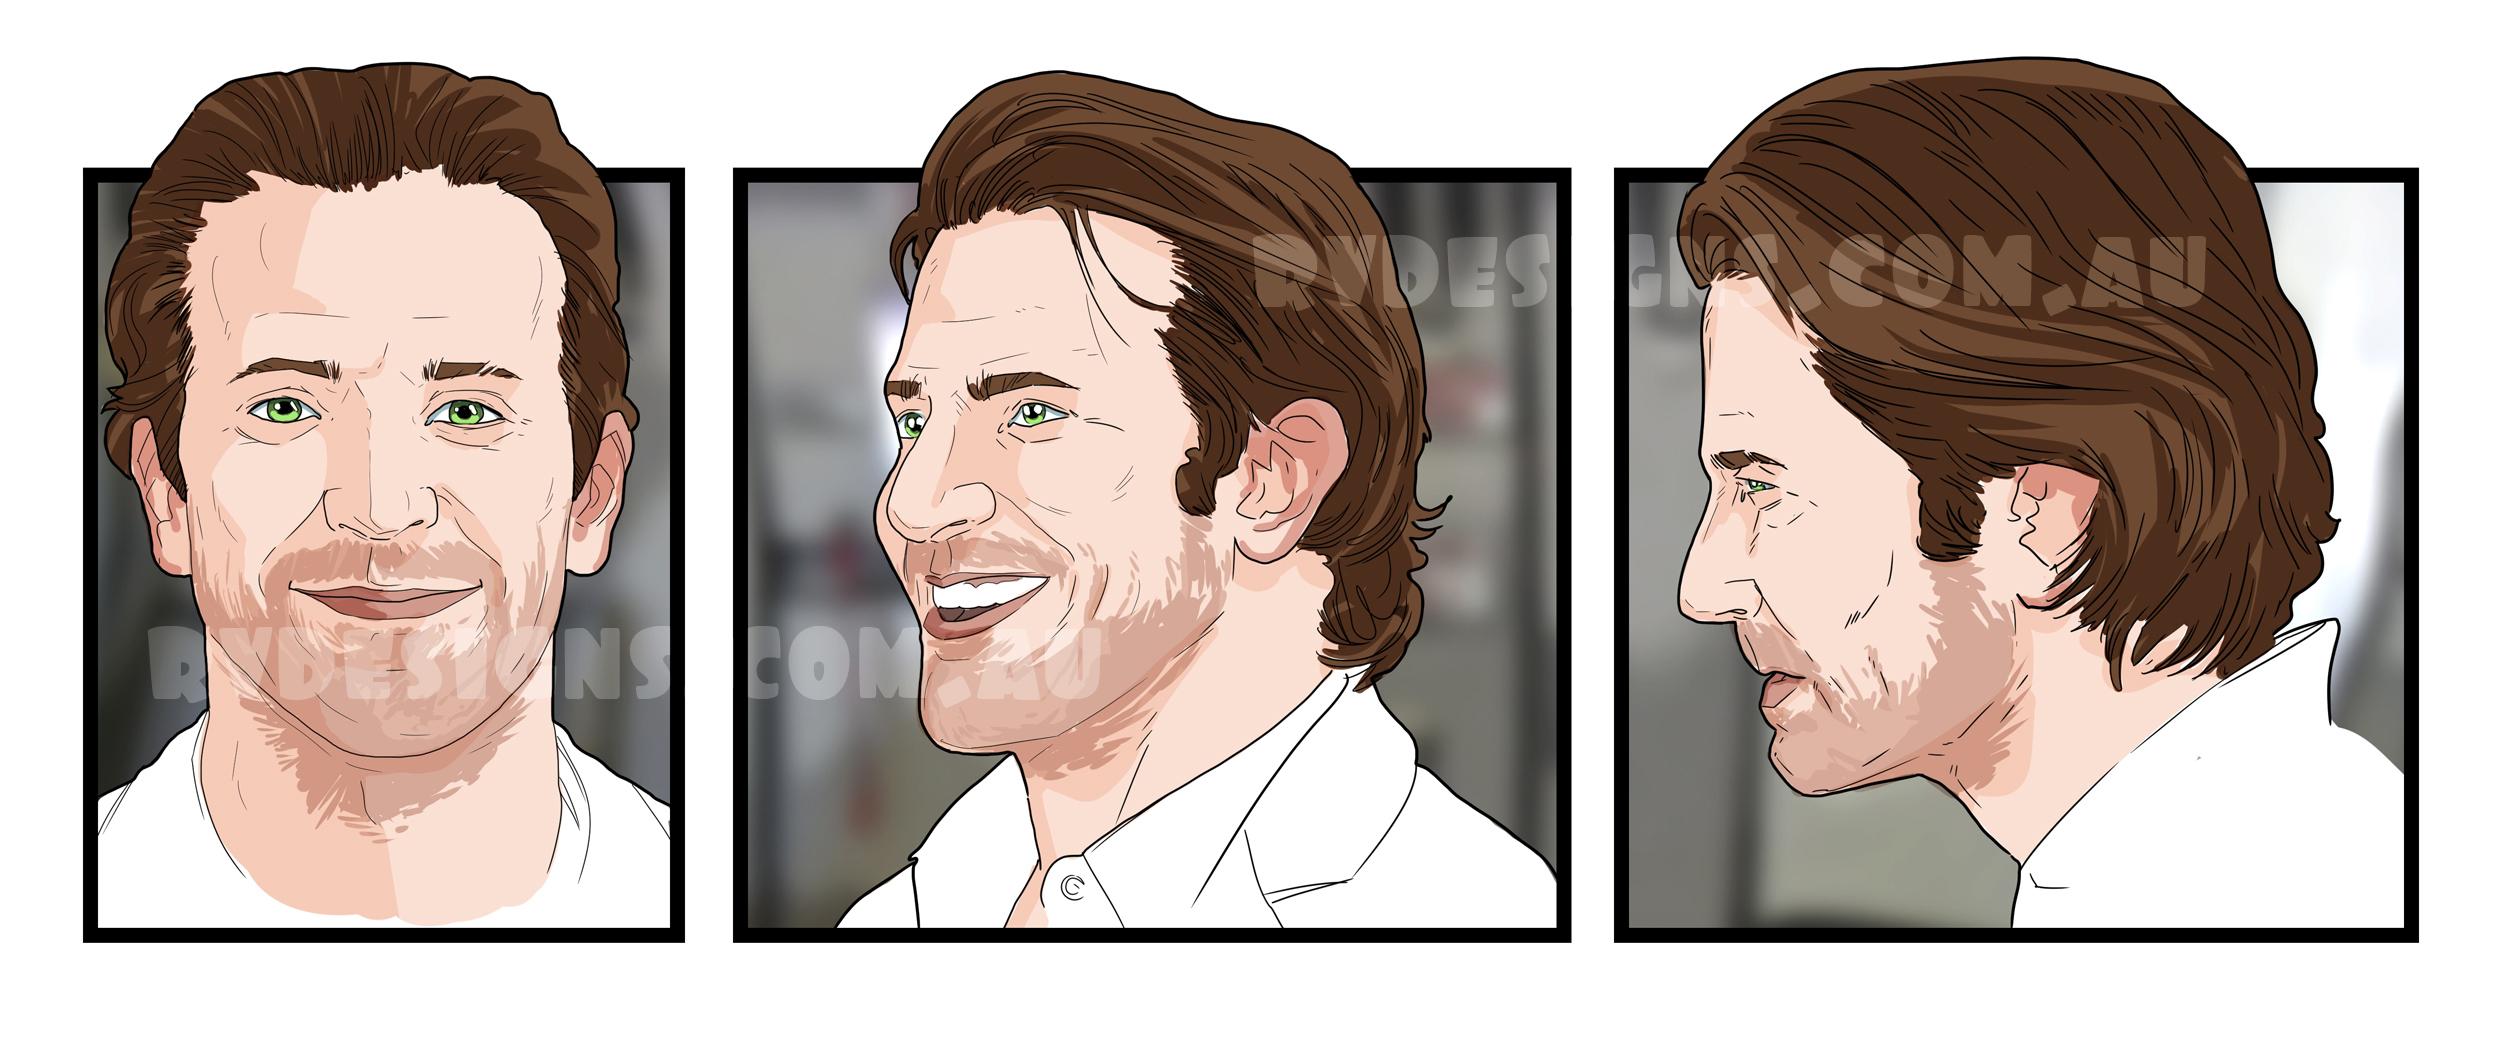 Bradley CooperS